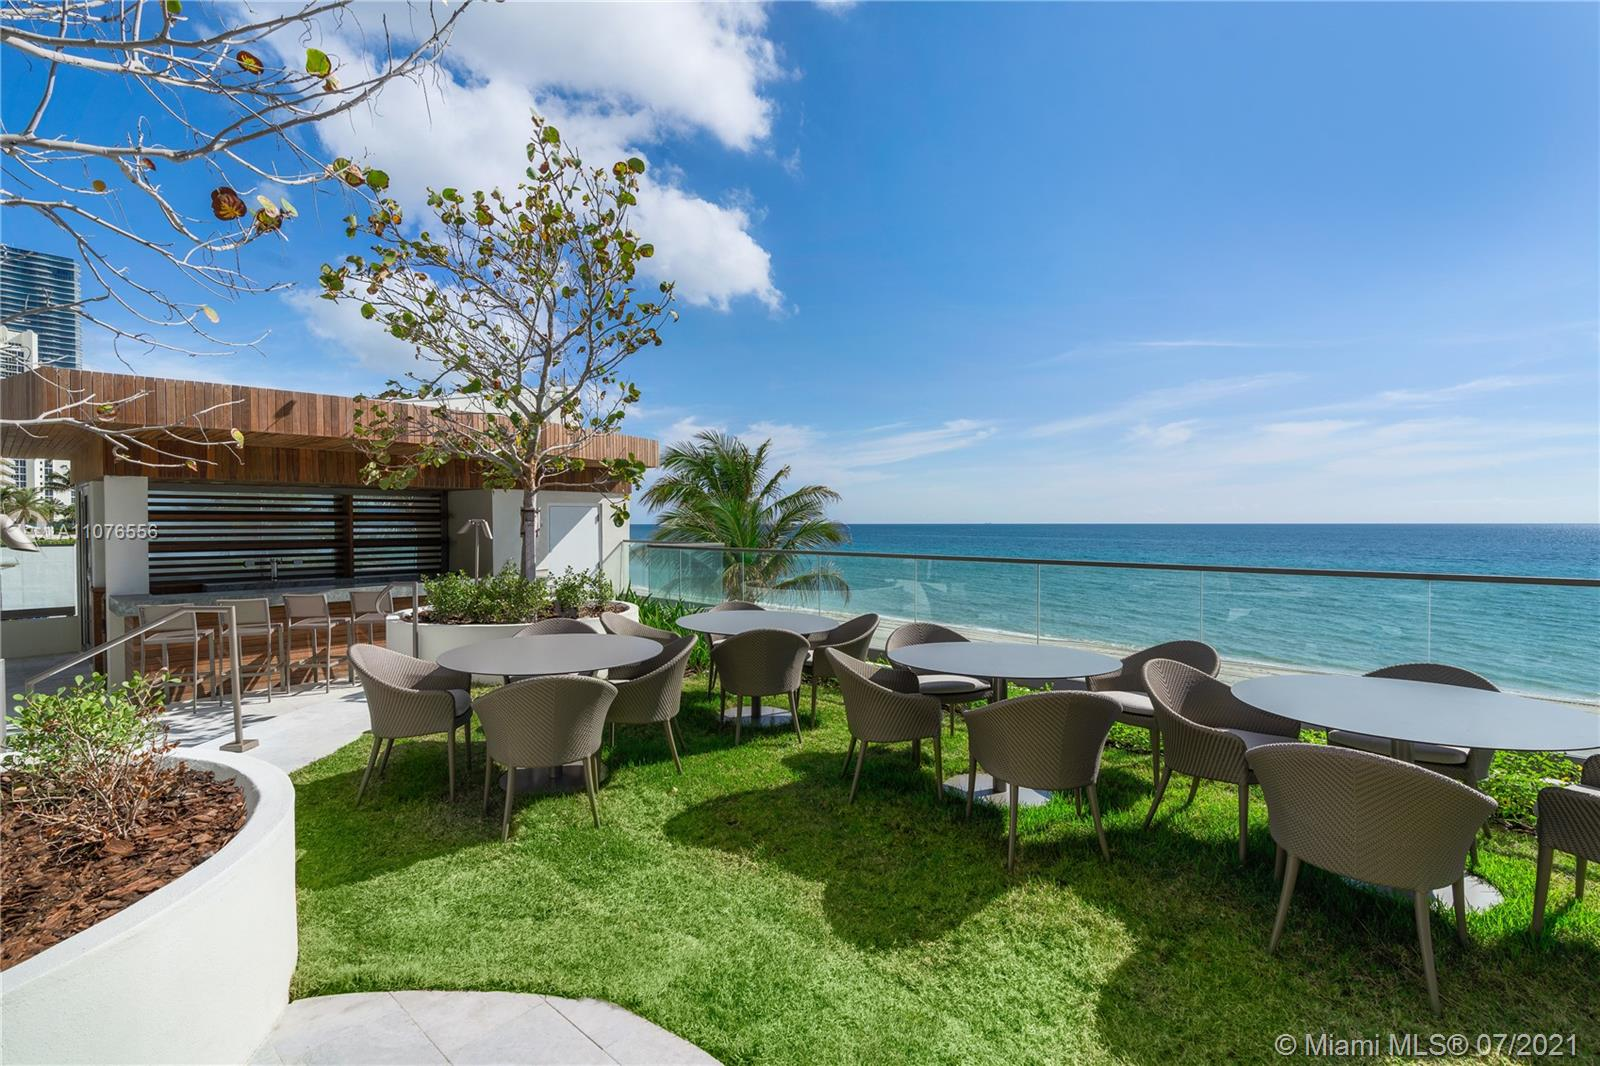 Photo of Residences by Armani Casa Apt 5202